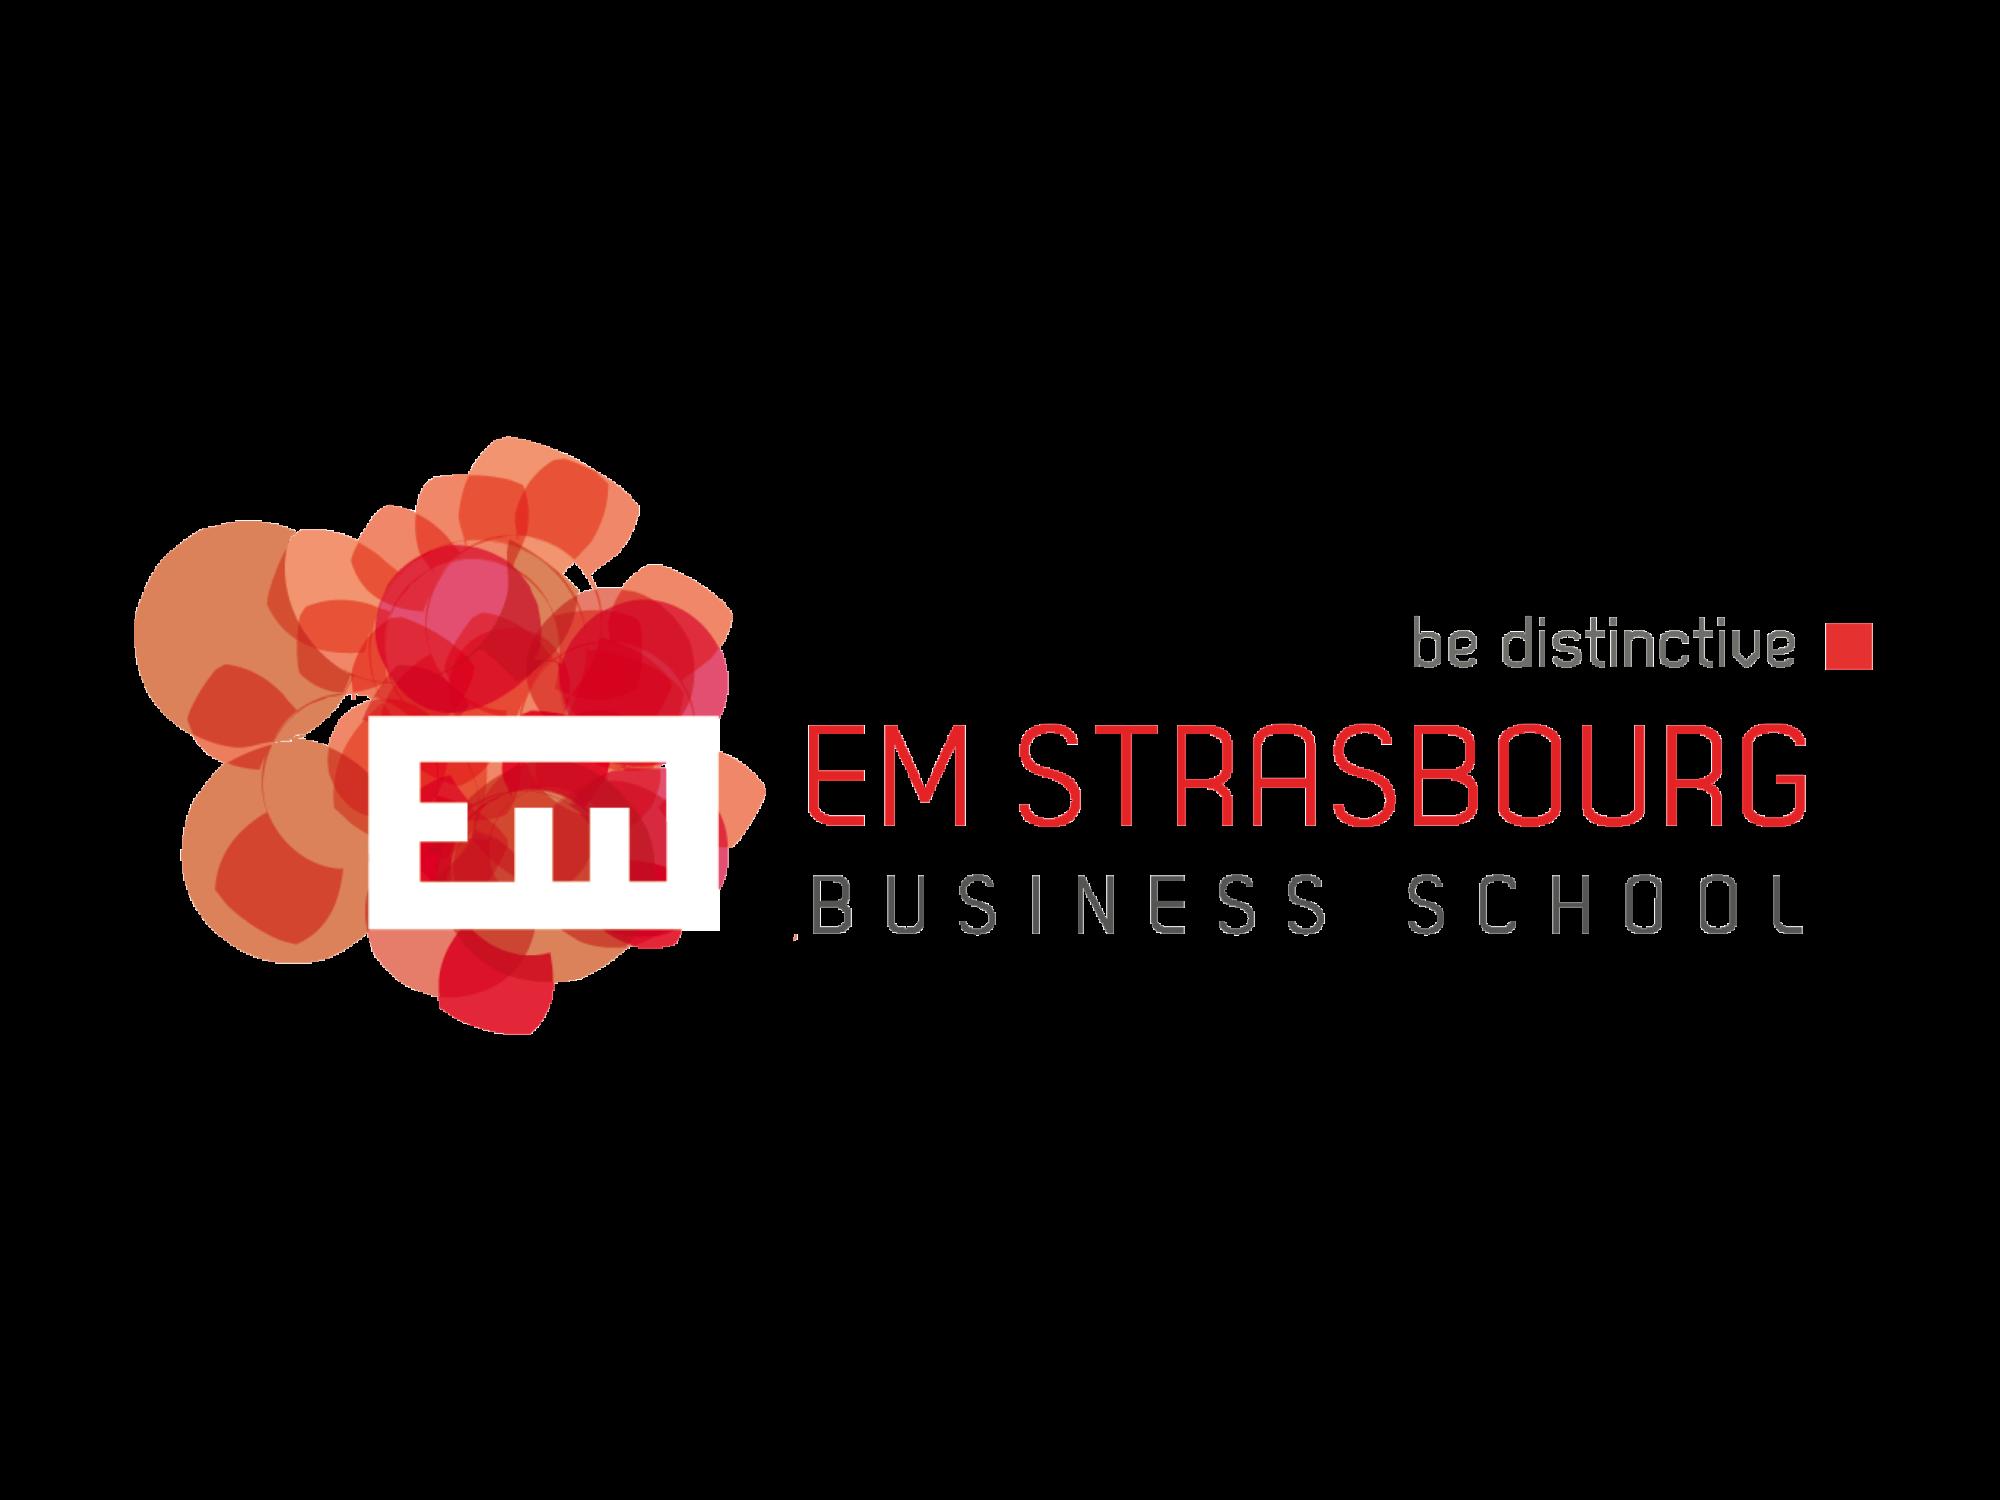 EM Strasbourg Business